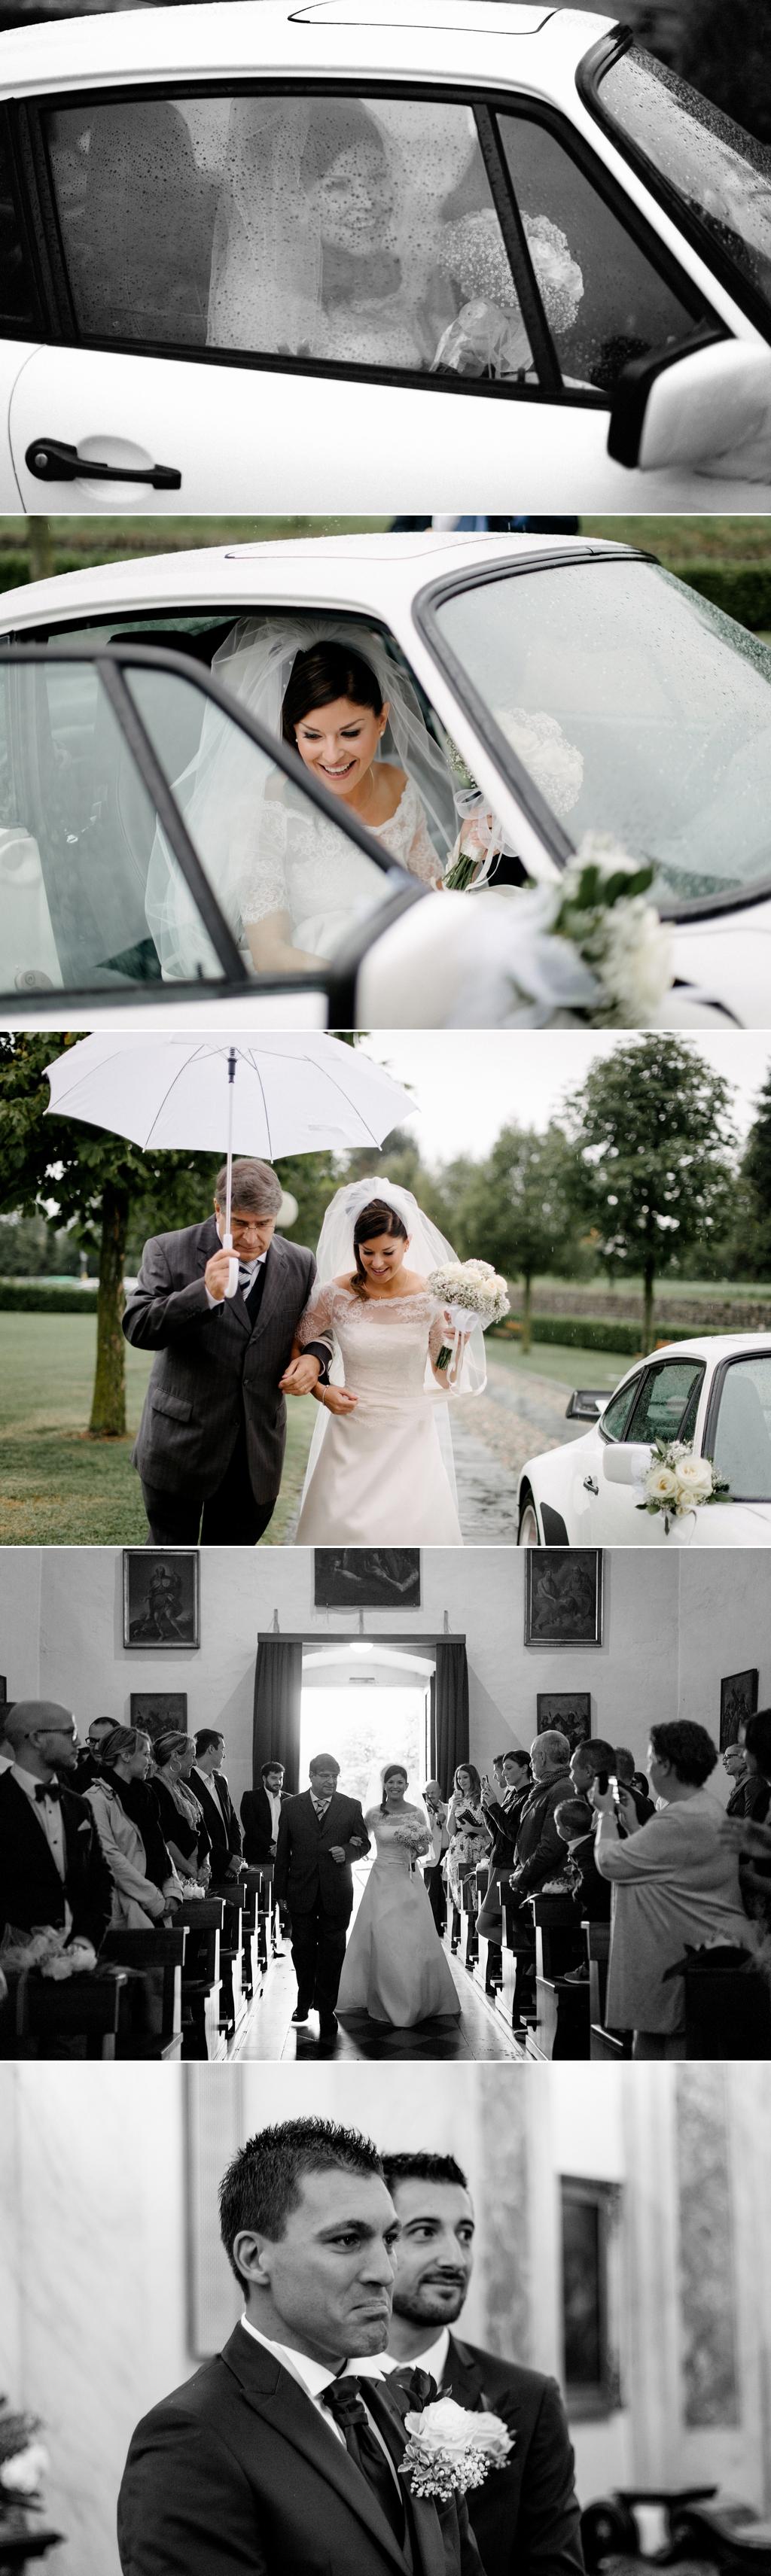 fotografo matrimonio arrivo sposa pioggia